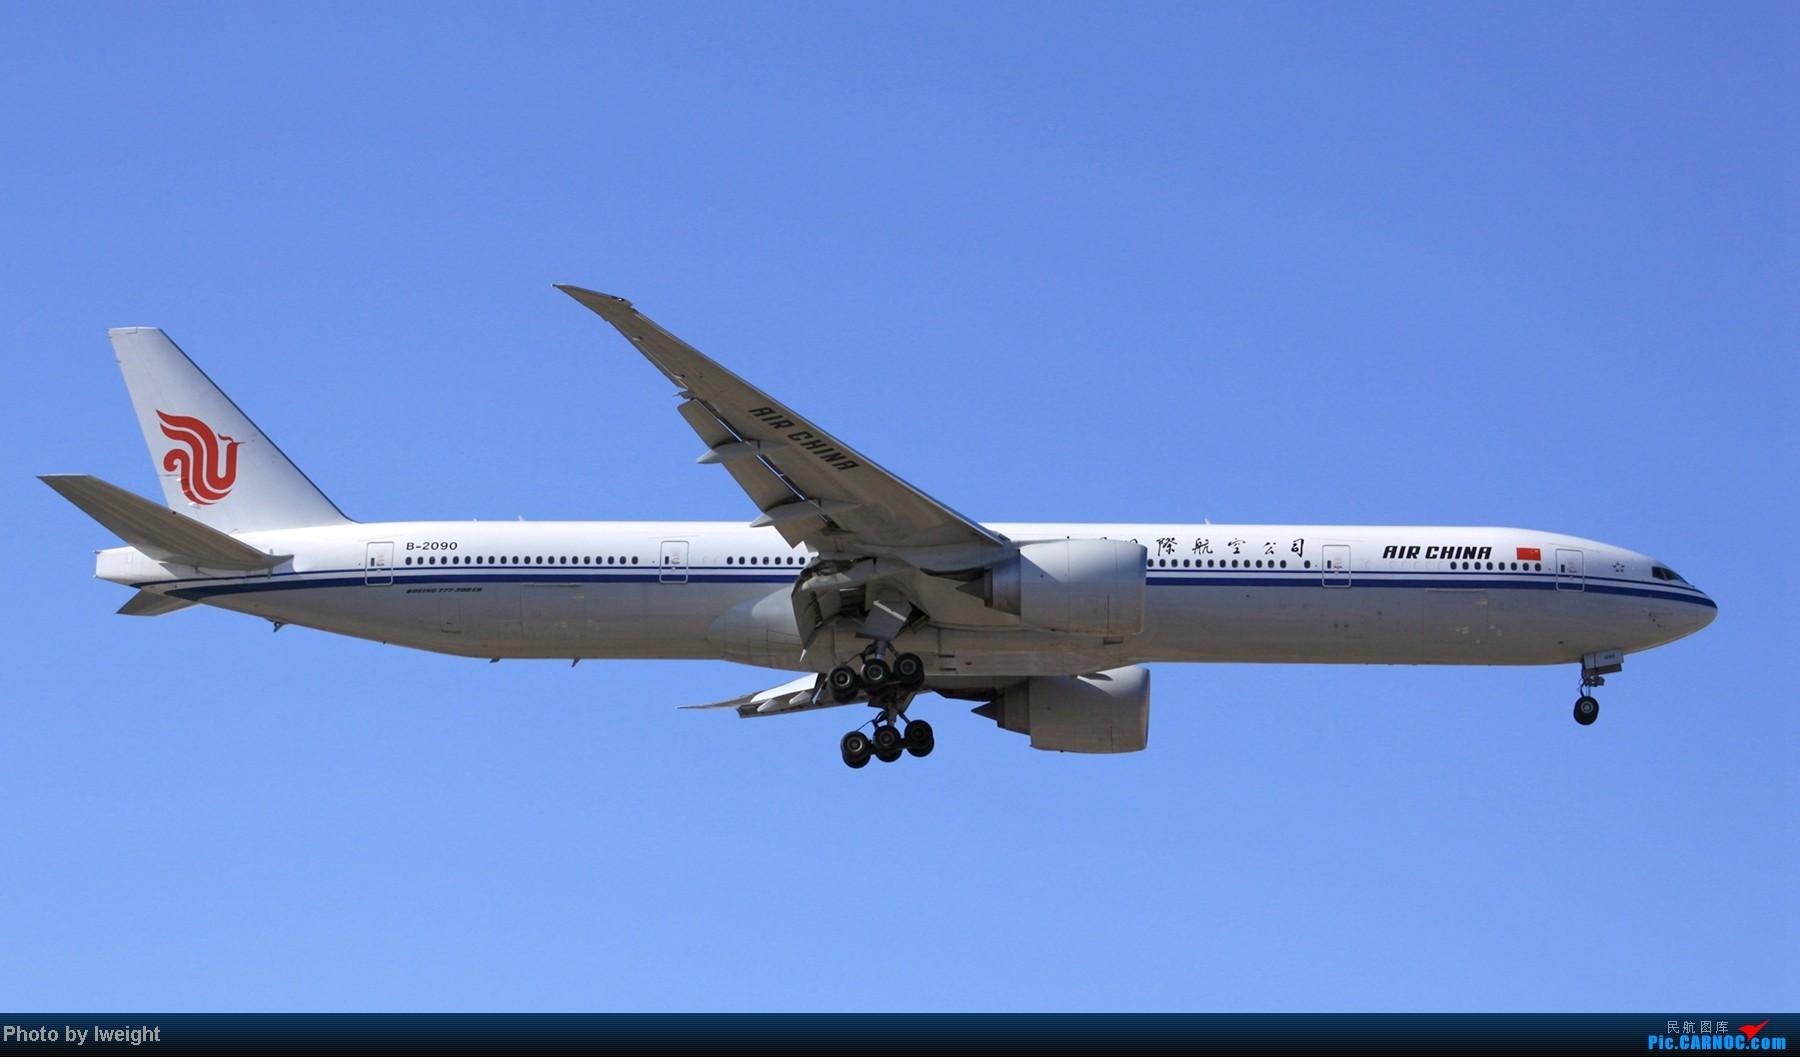 Re:[原创]春节期间首都机场拍机汇报 BOEING 777-300 B-2090 中国北京首都机场